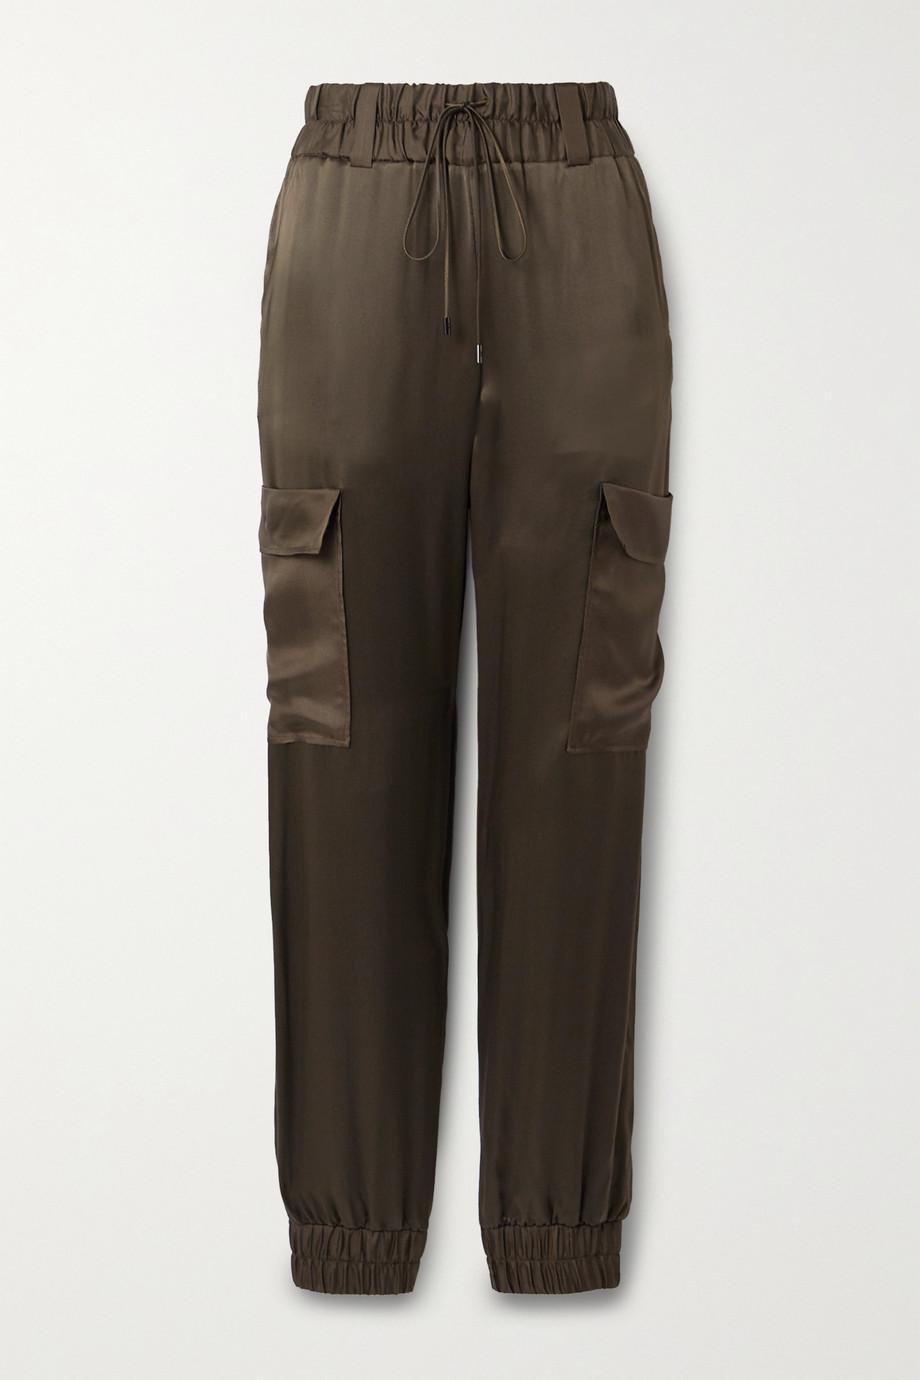 TOM FORD Silk-satin track pants